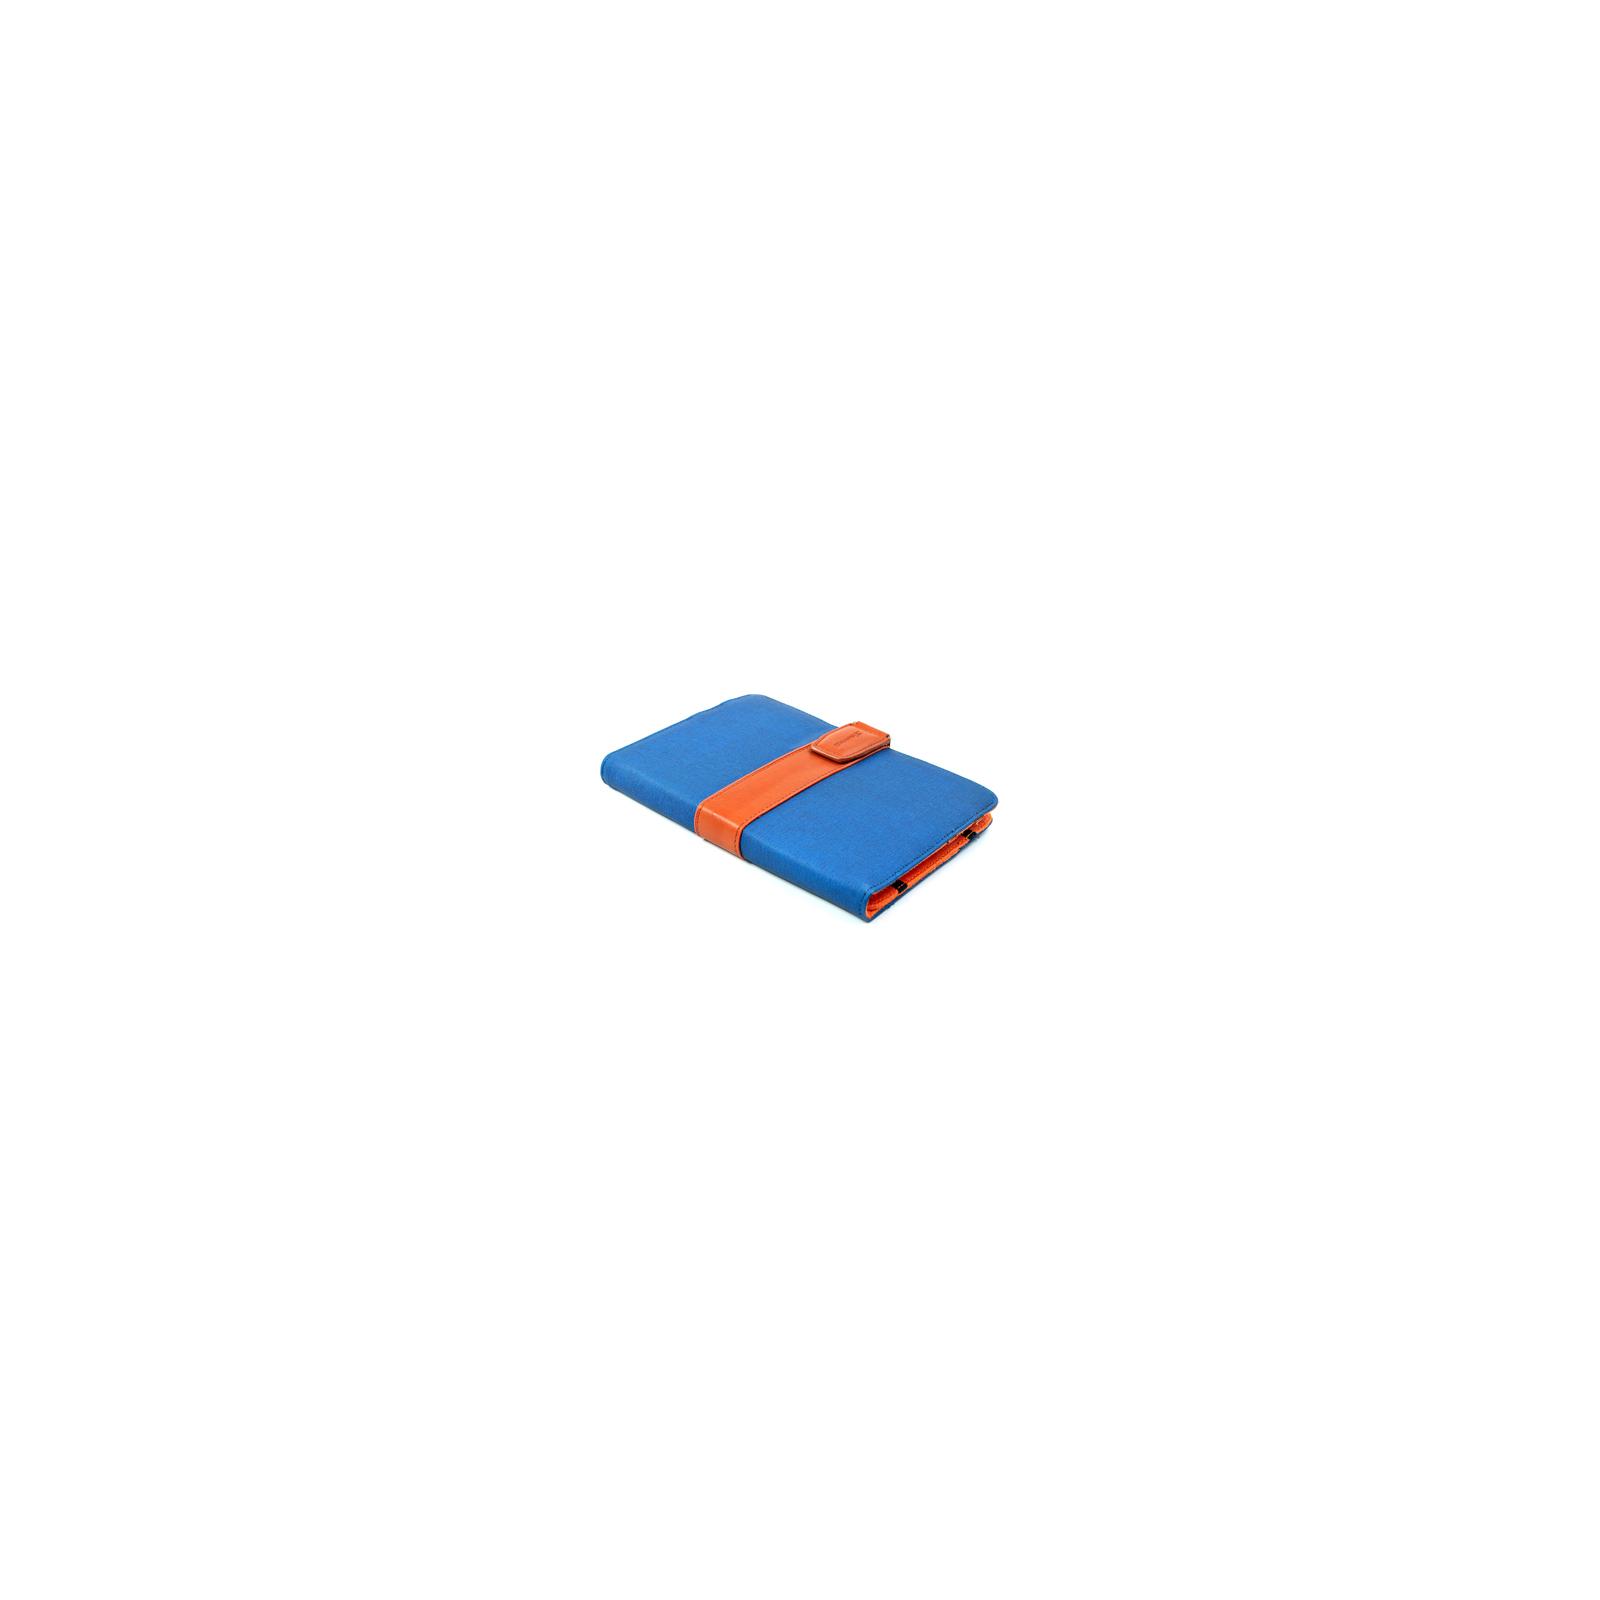 Чехол для планшета Grand-X 7 Jersey 725 Blue (UTC - JR725BL)